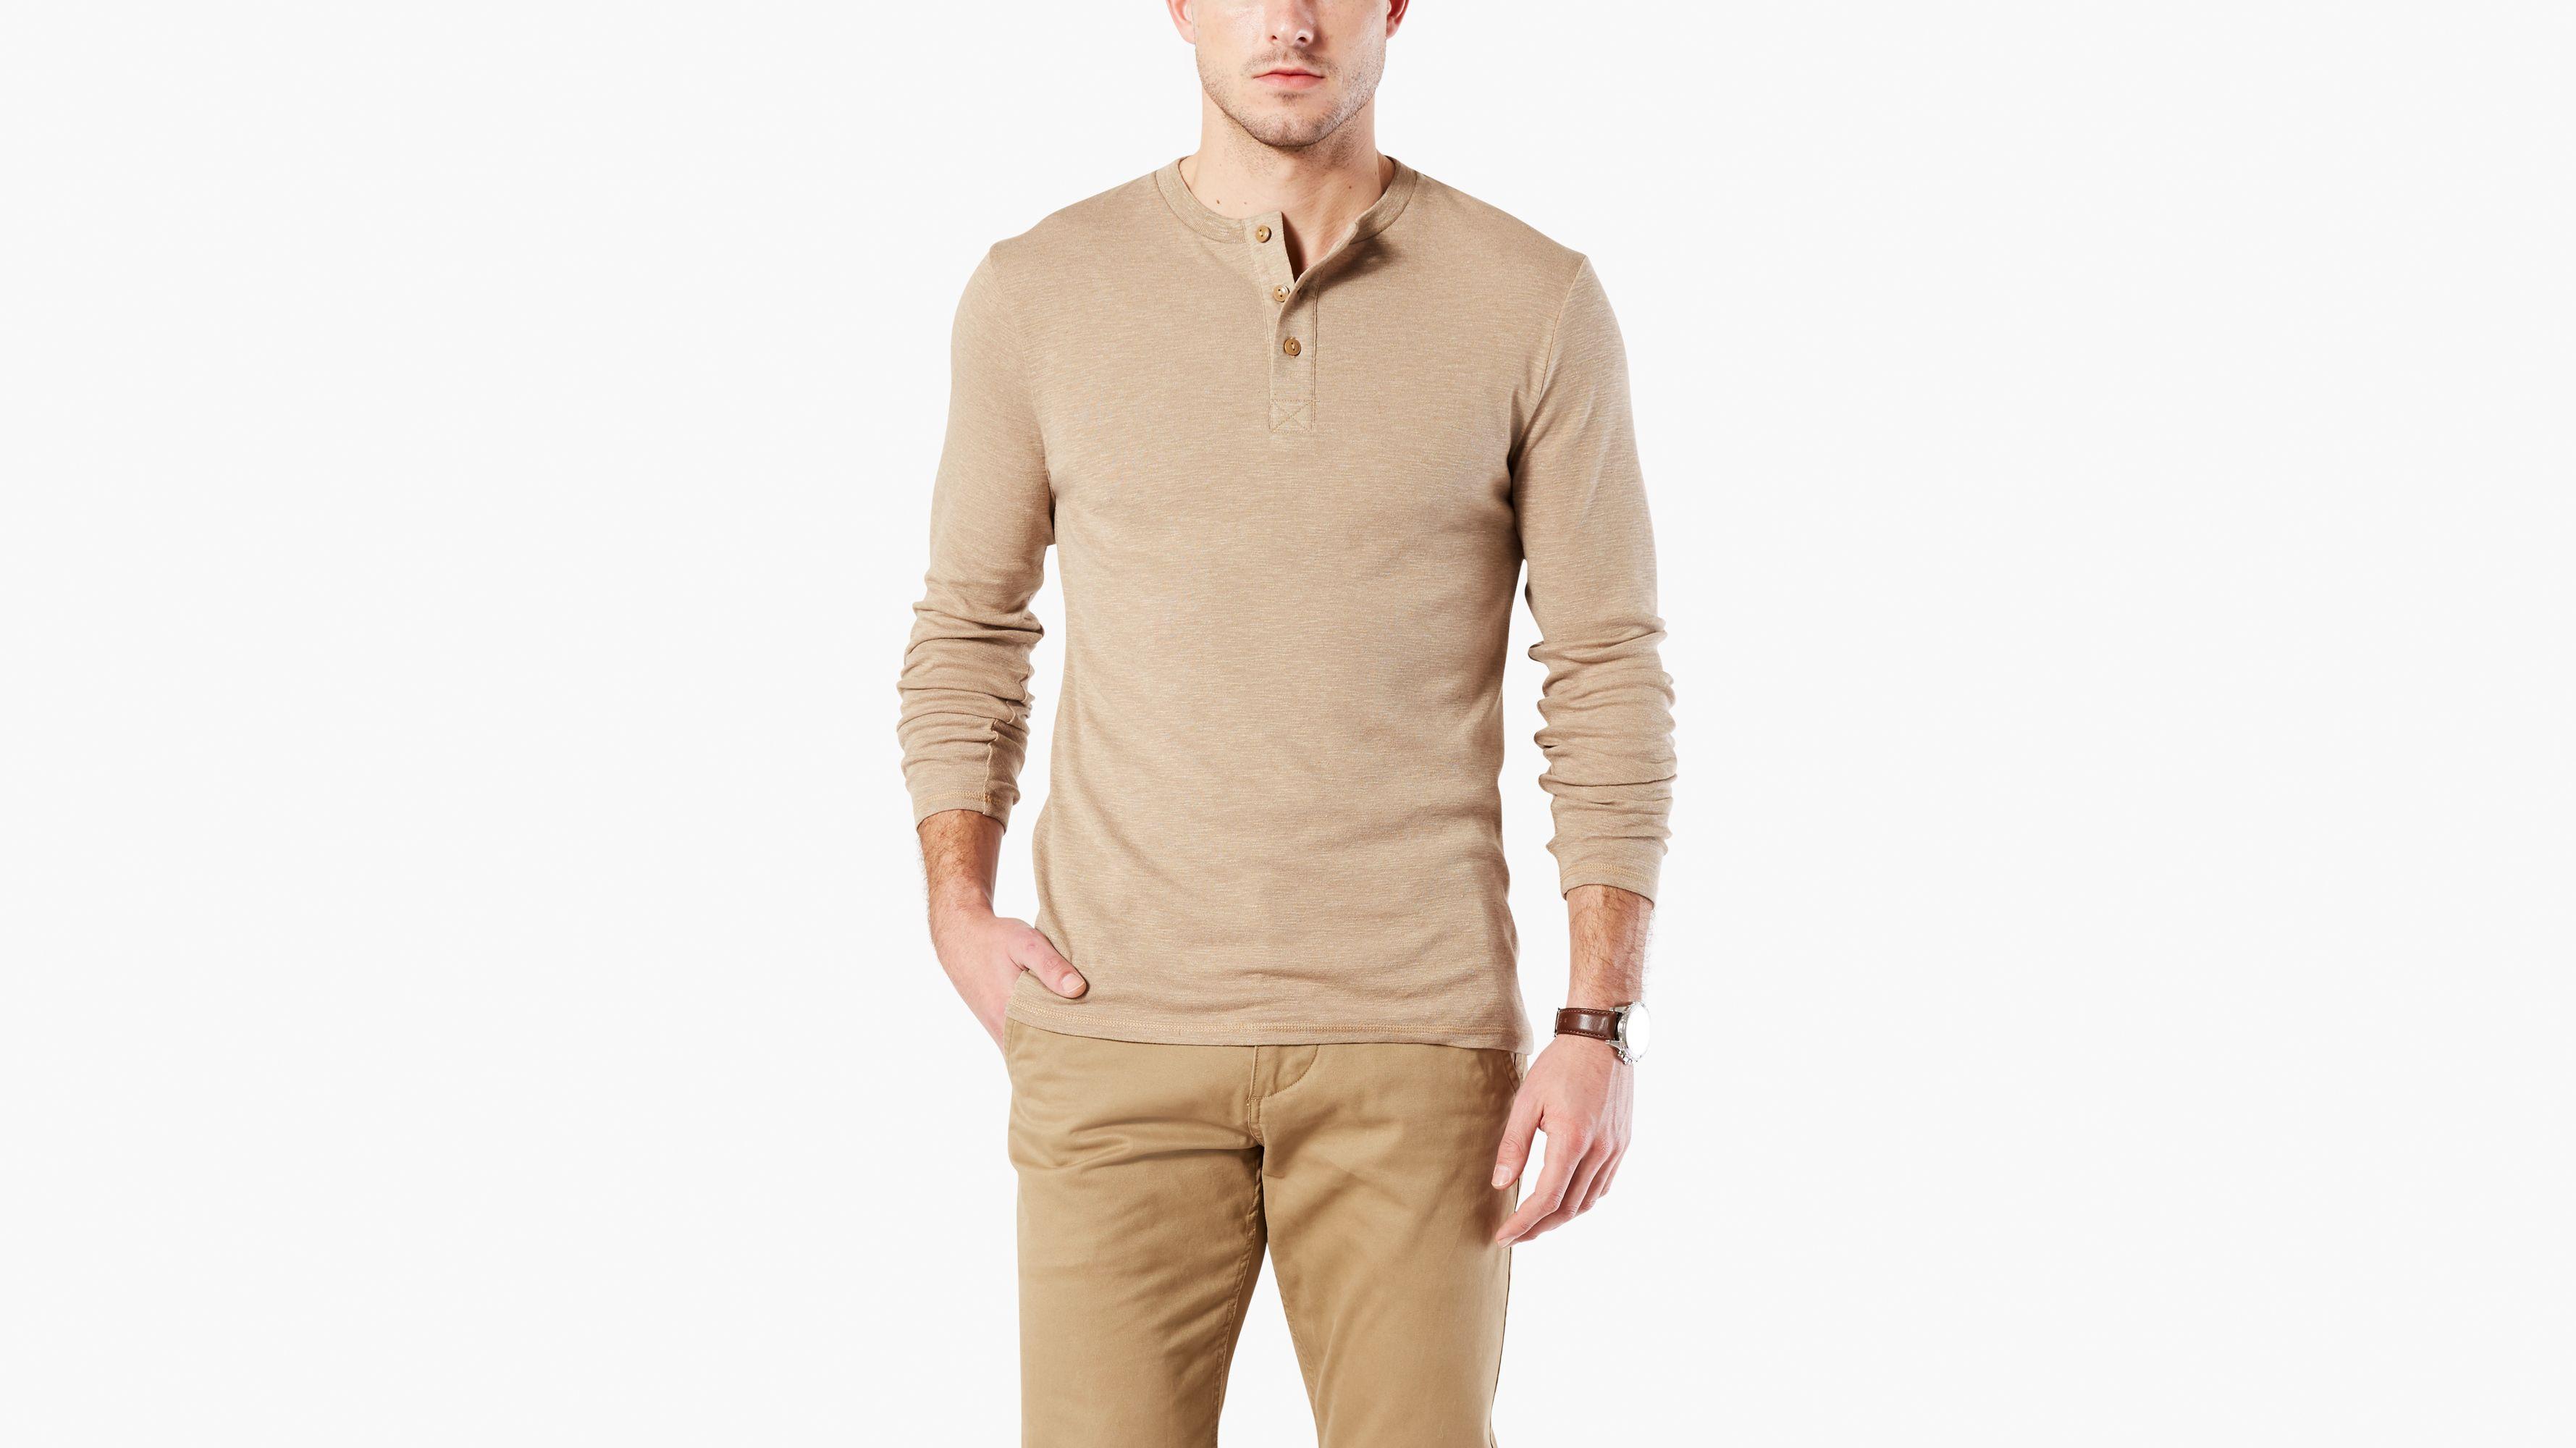 khaki henley shirt